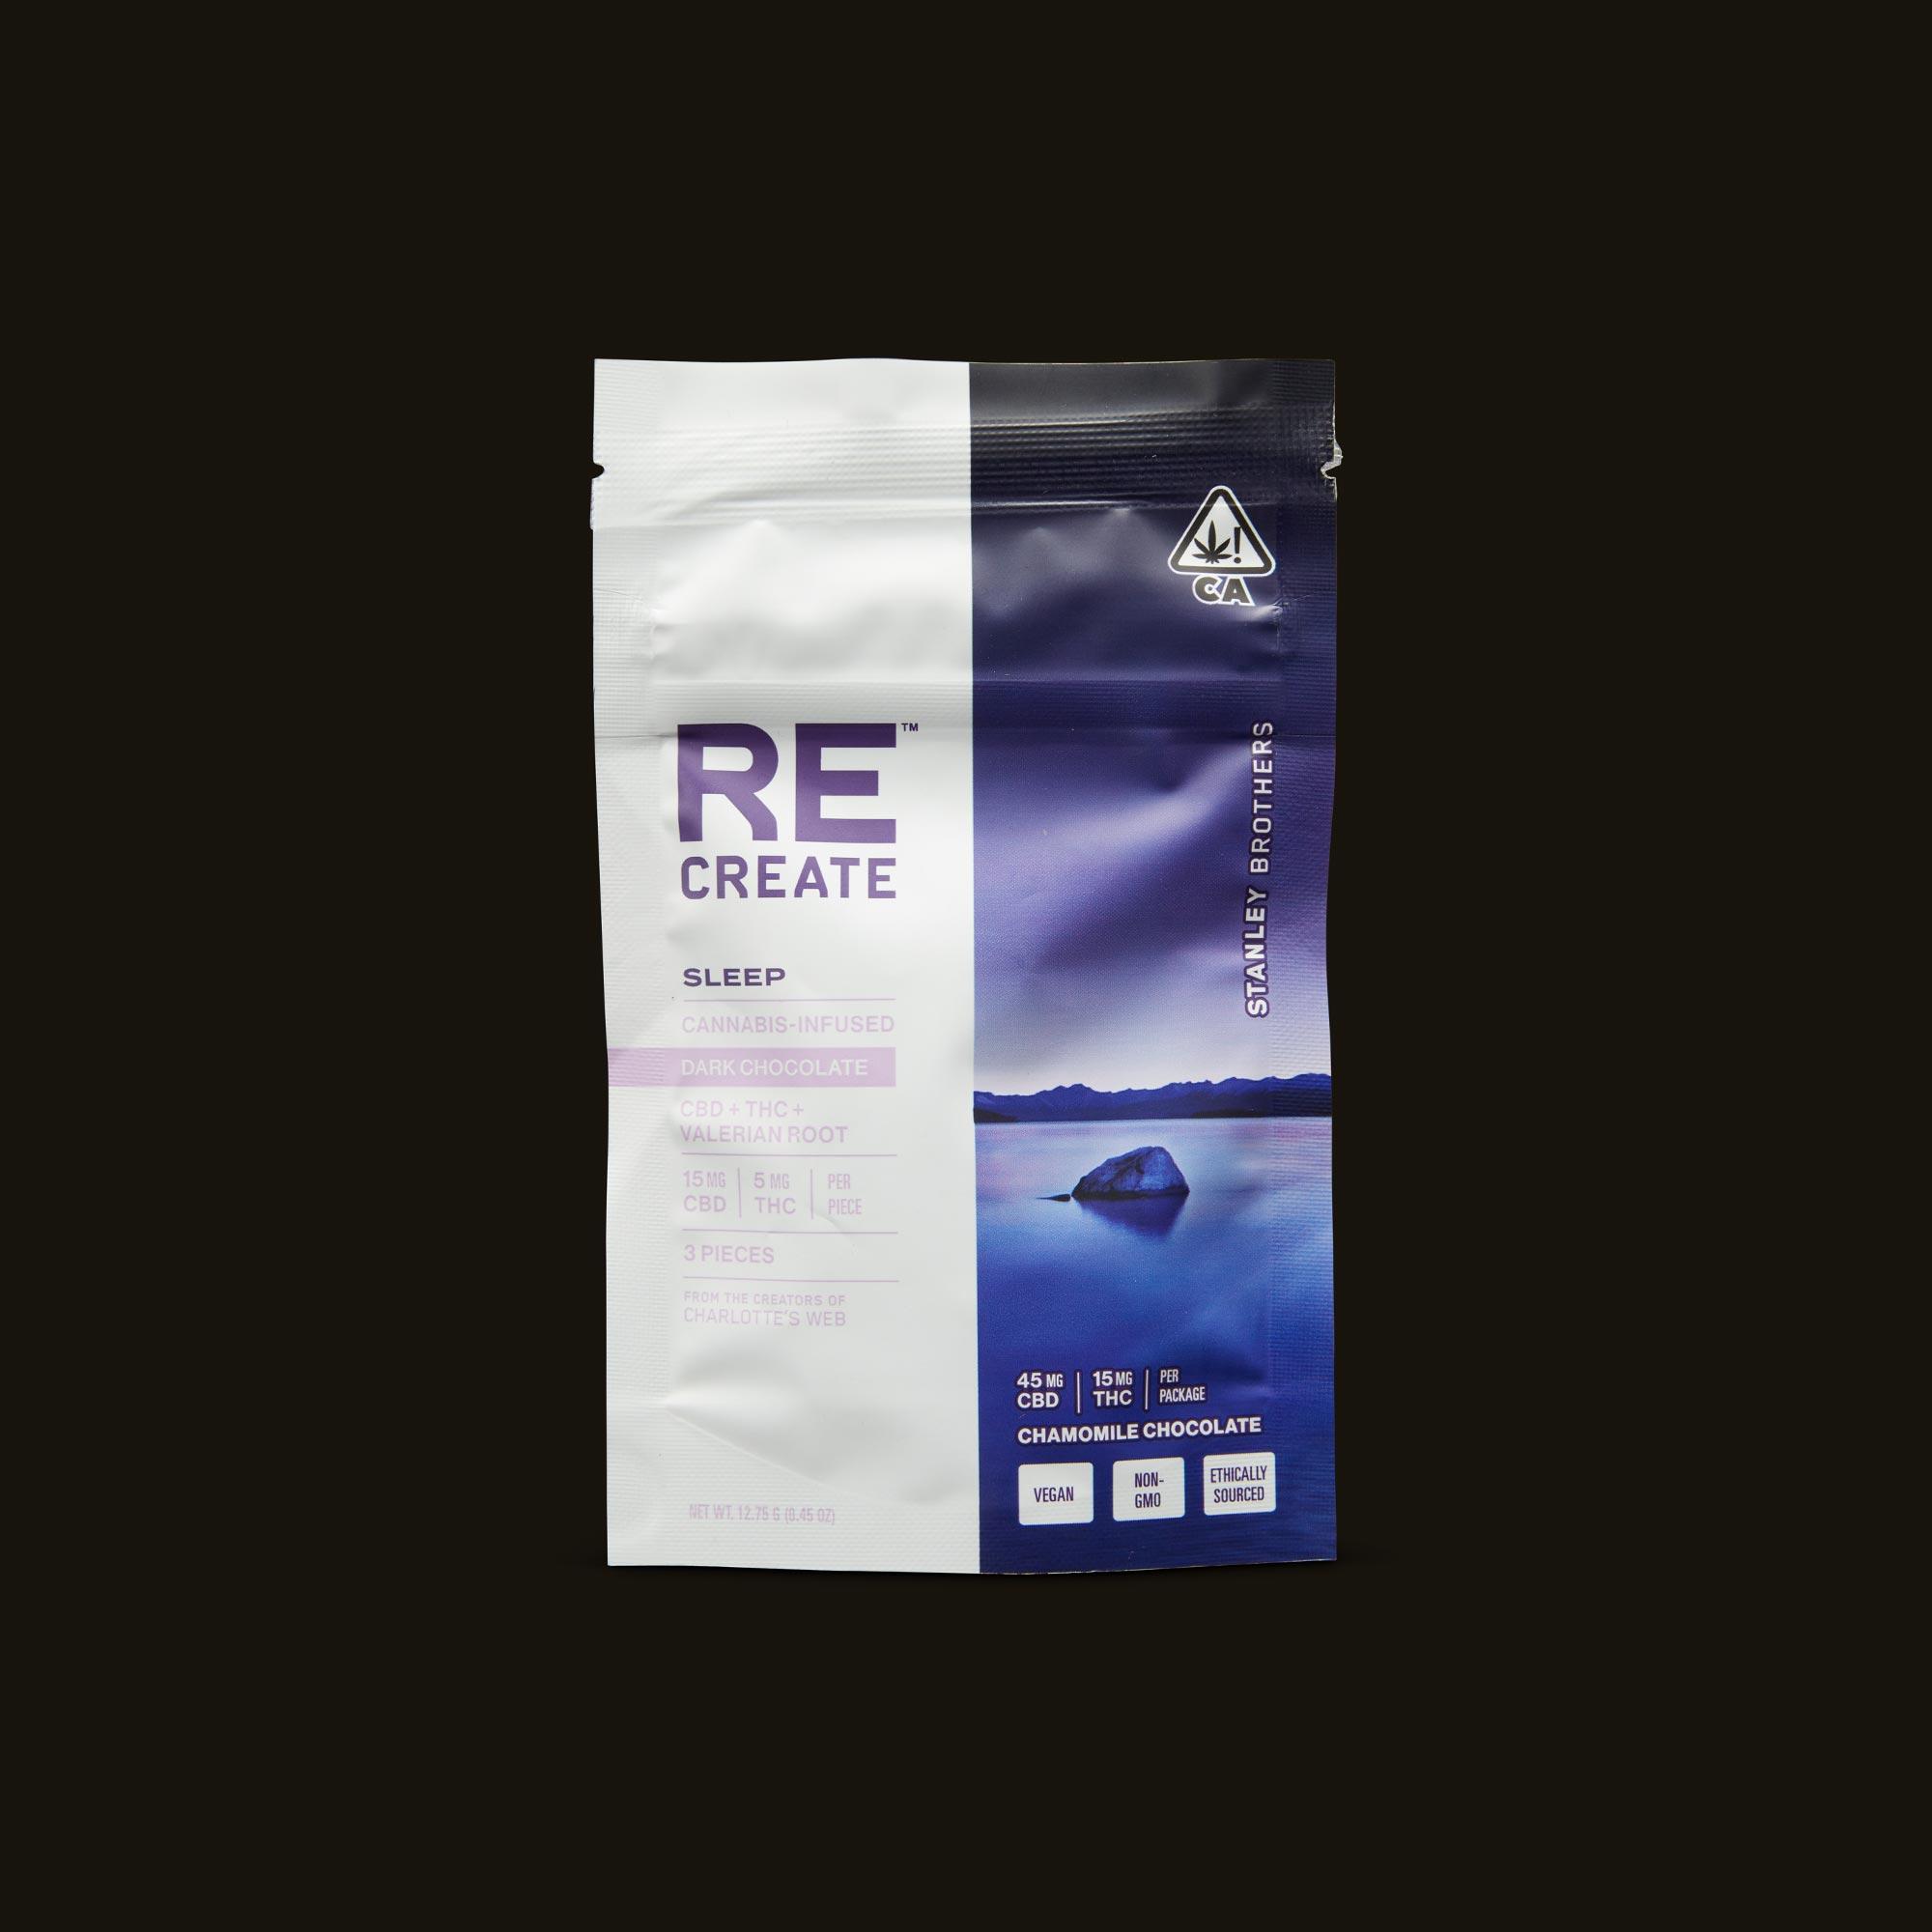 ReCreate Sleep Chocolate - 3 piece Front Packaging